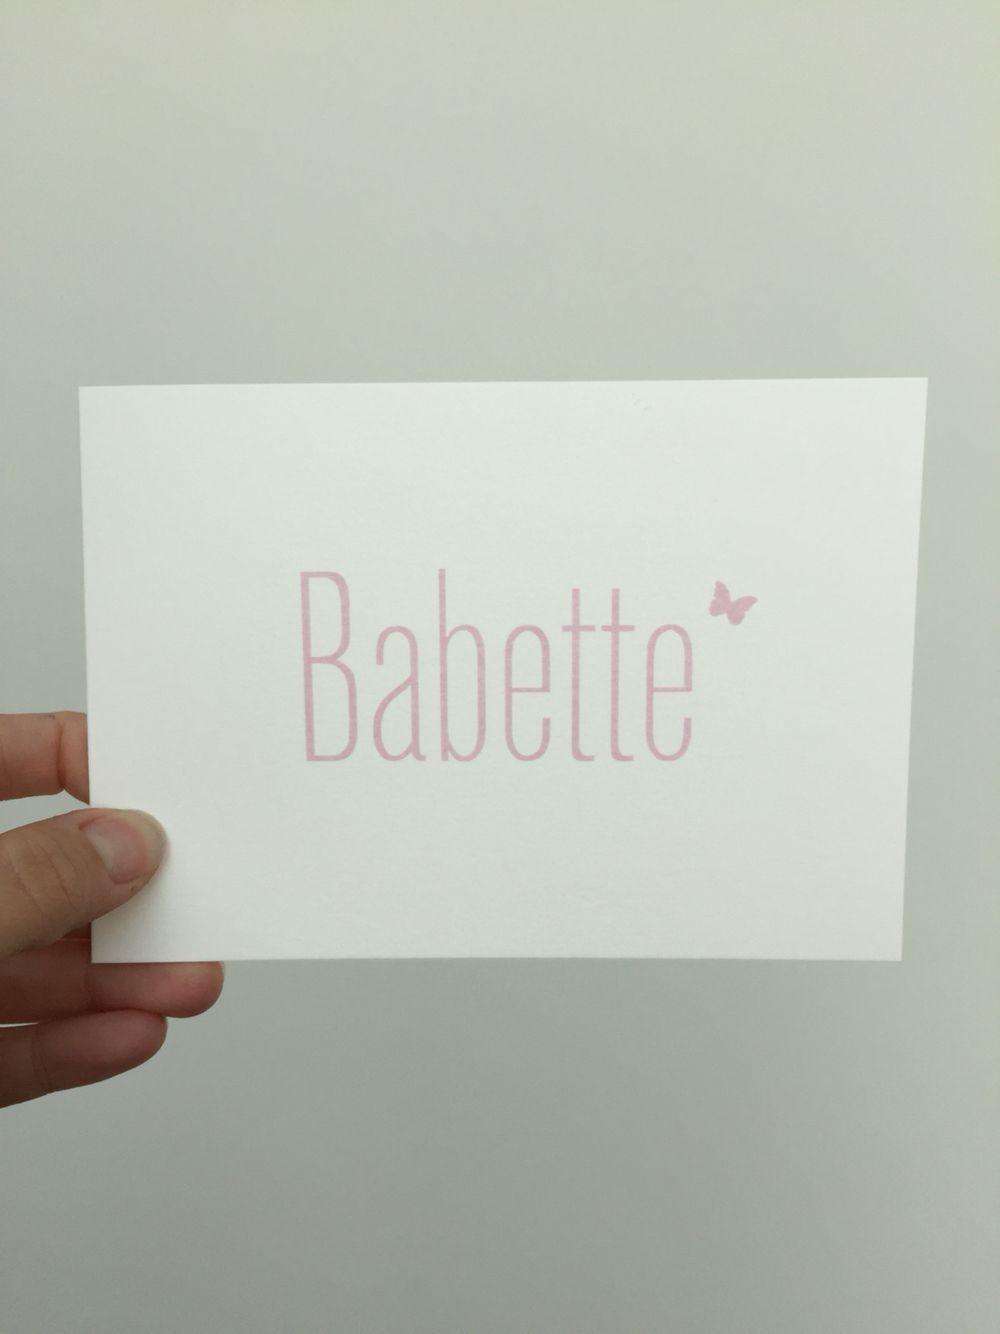 Babette Geboortekaartje Geboortekaartje Babette In 2020 Babynamen Liste Babynamen Geburtsanzeige